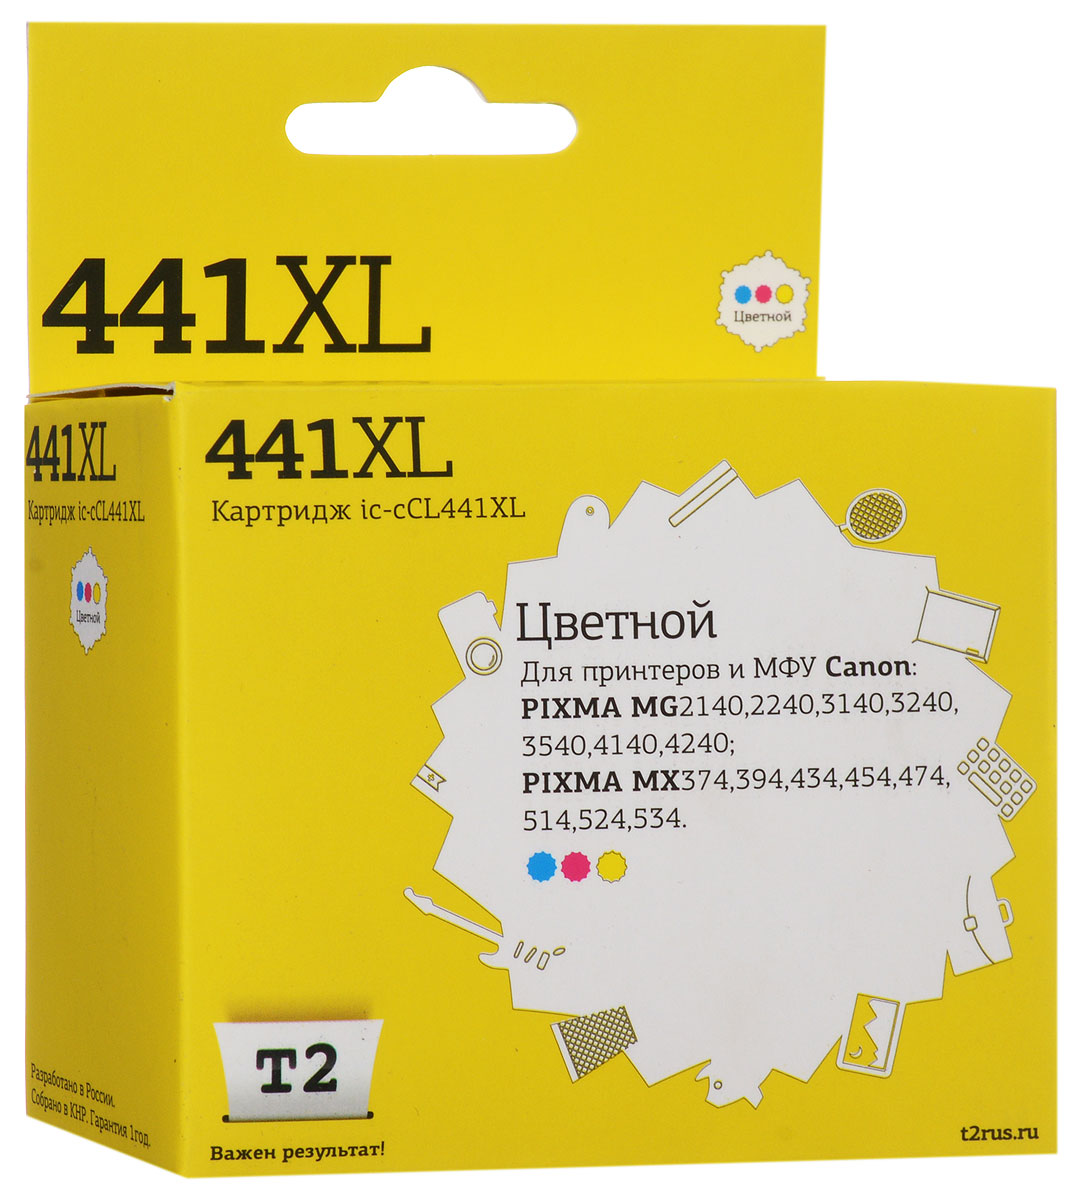 T2 IC-CCL441XL картридж (аналог CL-441 XL) для Canon PIXMA MG2140/3140/3540/MX394/434/474 картридж t2 ic cpg440xl для canon pixma mg2140 3140 3540 mx394 434 474 black